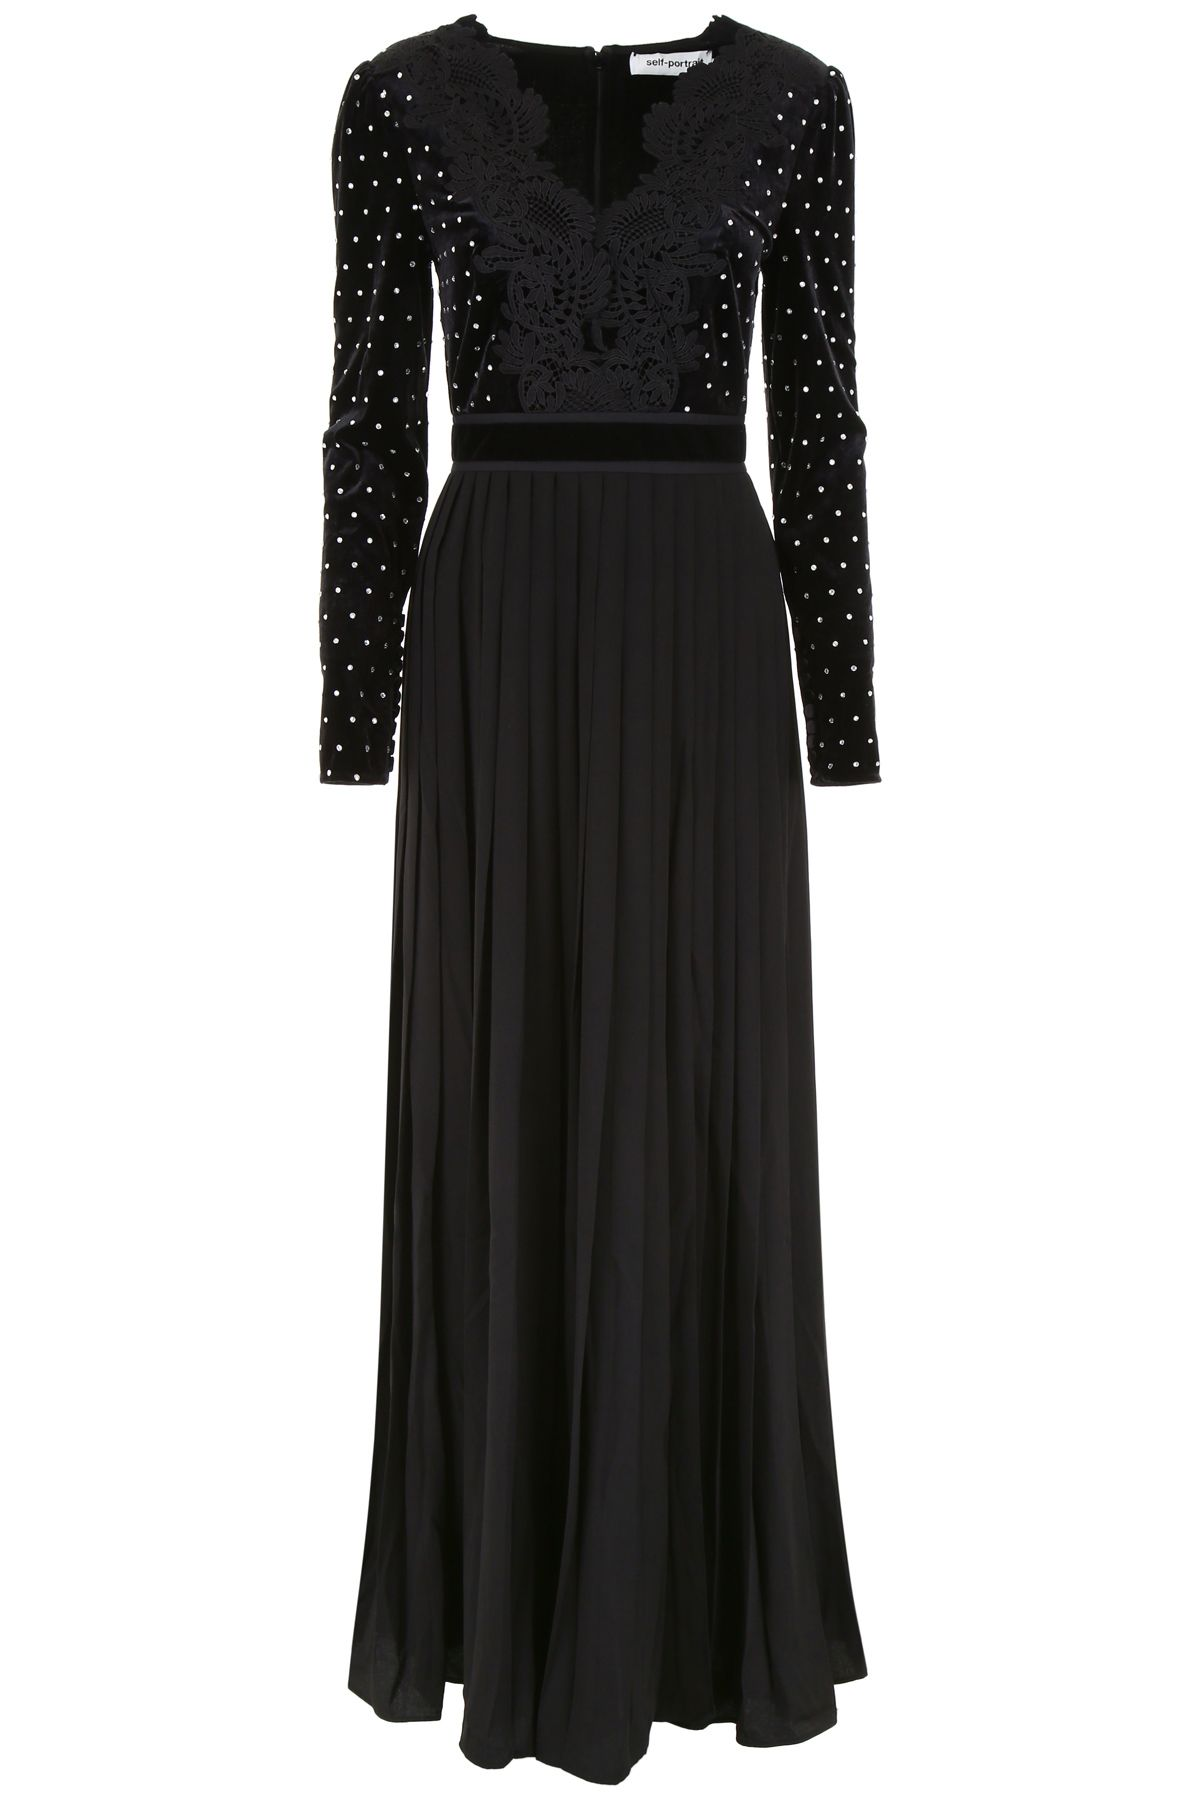 self-portrait Dress With Lace Neckline